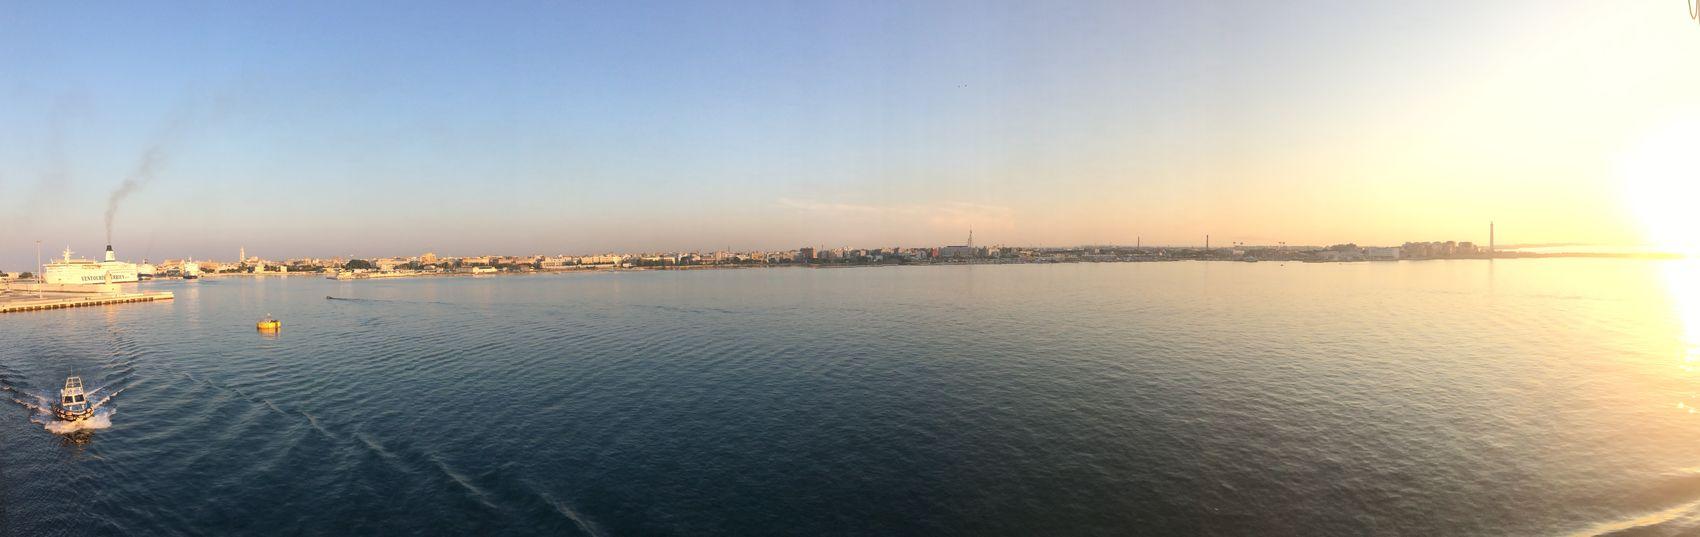 Leaving Bari 😉 CORFU ISLAND here we come 😍